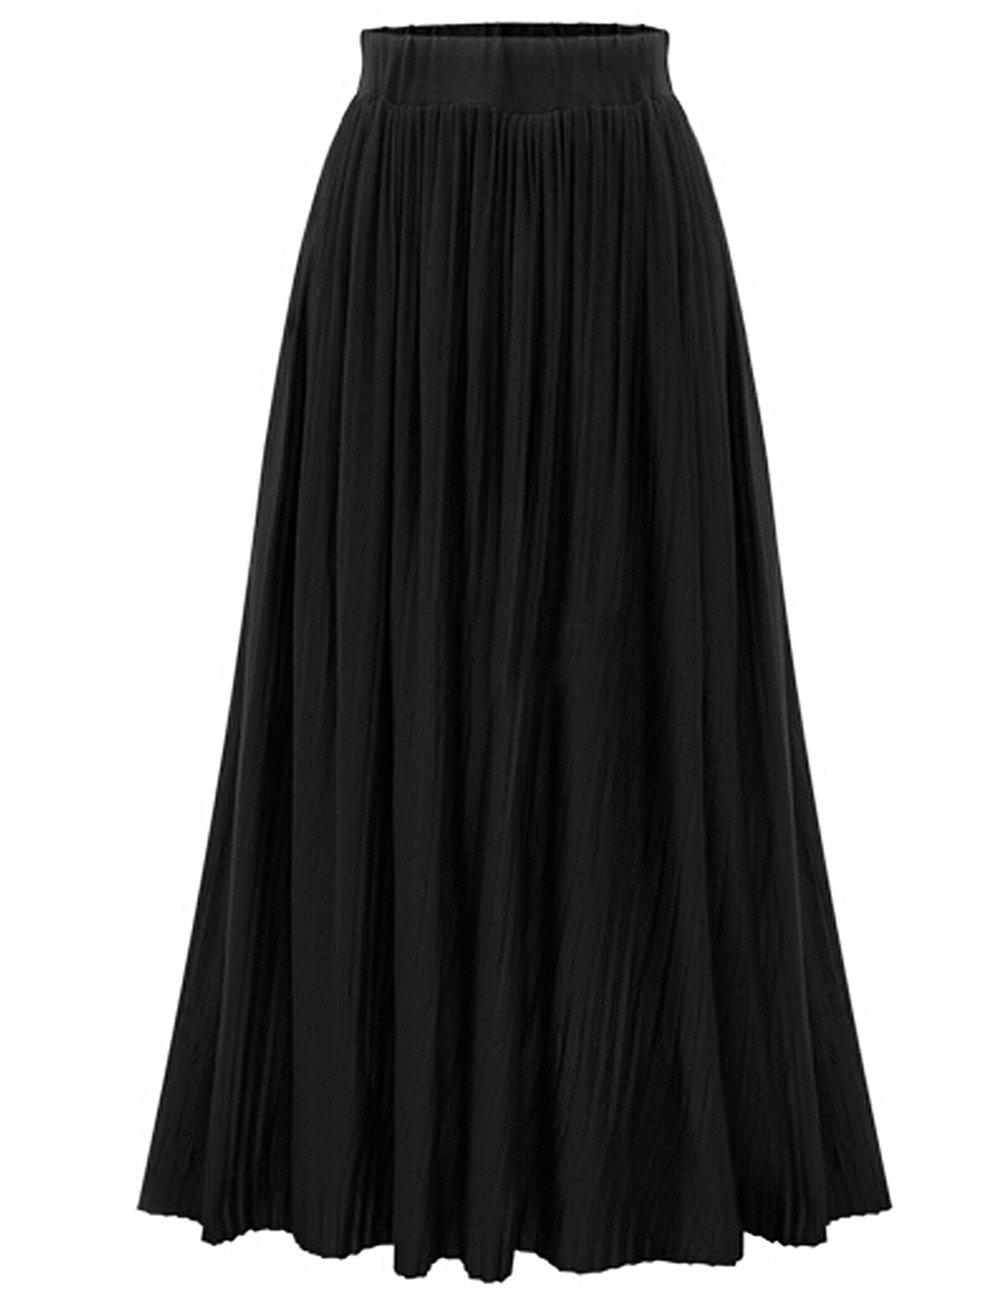 Women's Fashion Pleated Skirt Midi A Line Skirt